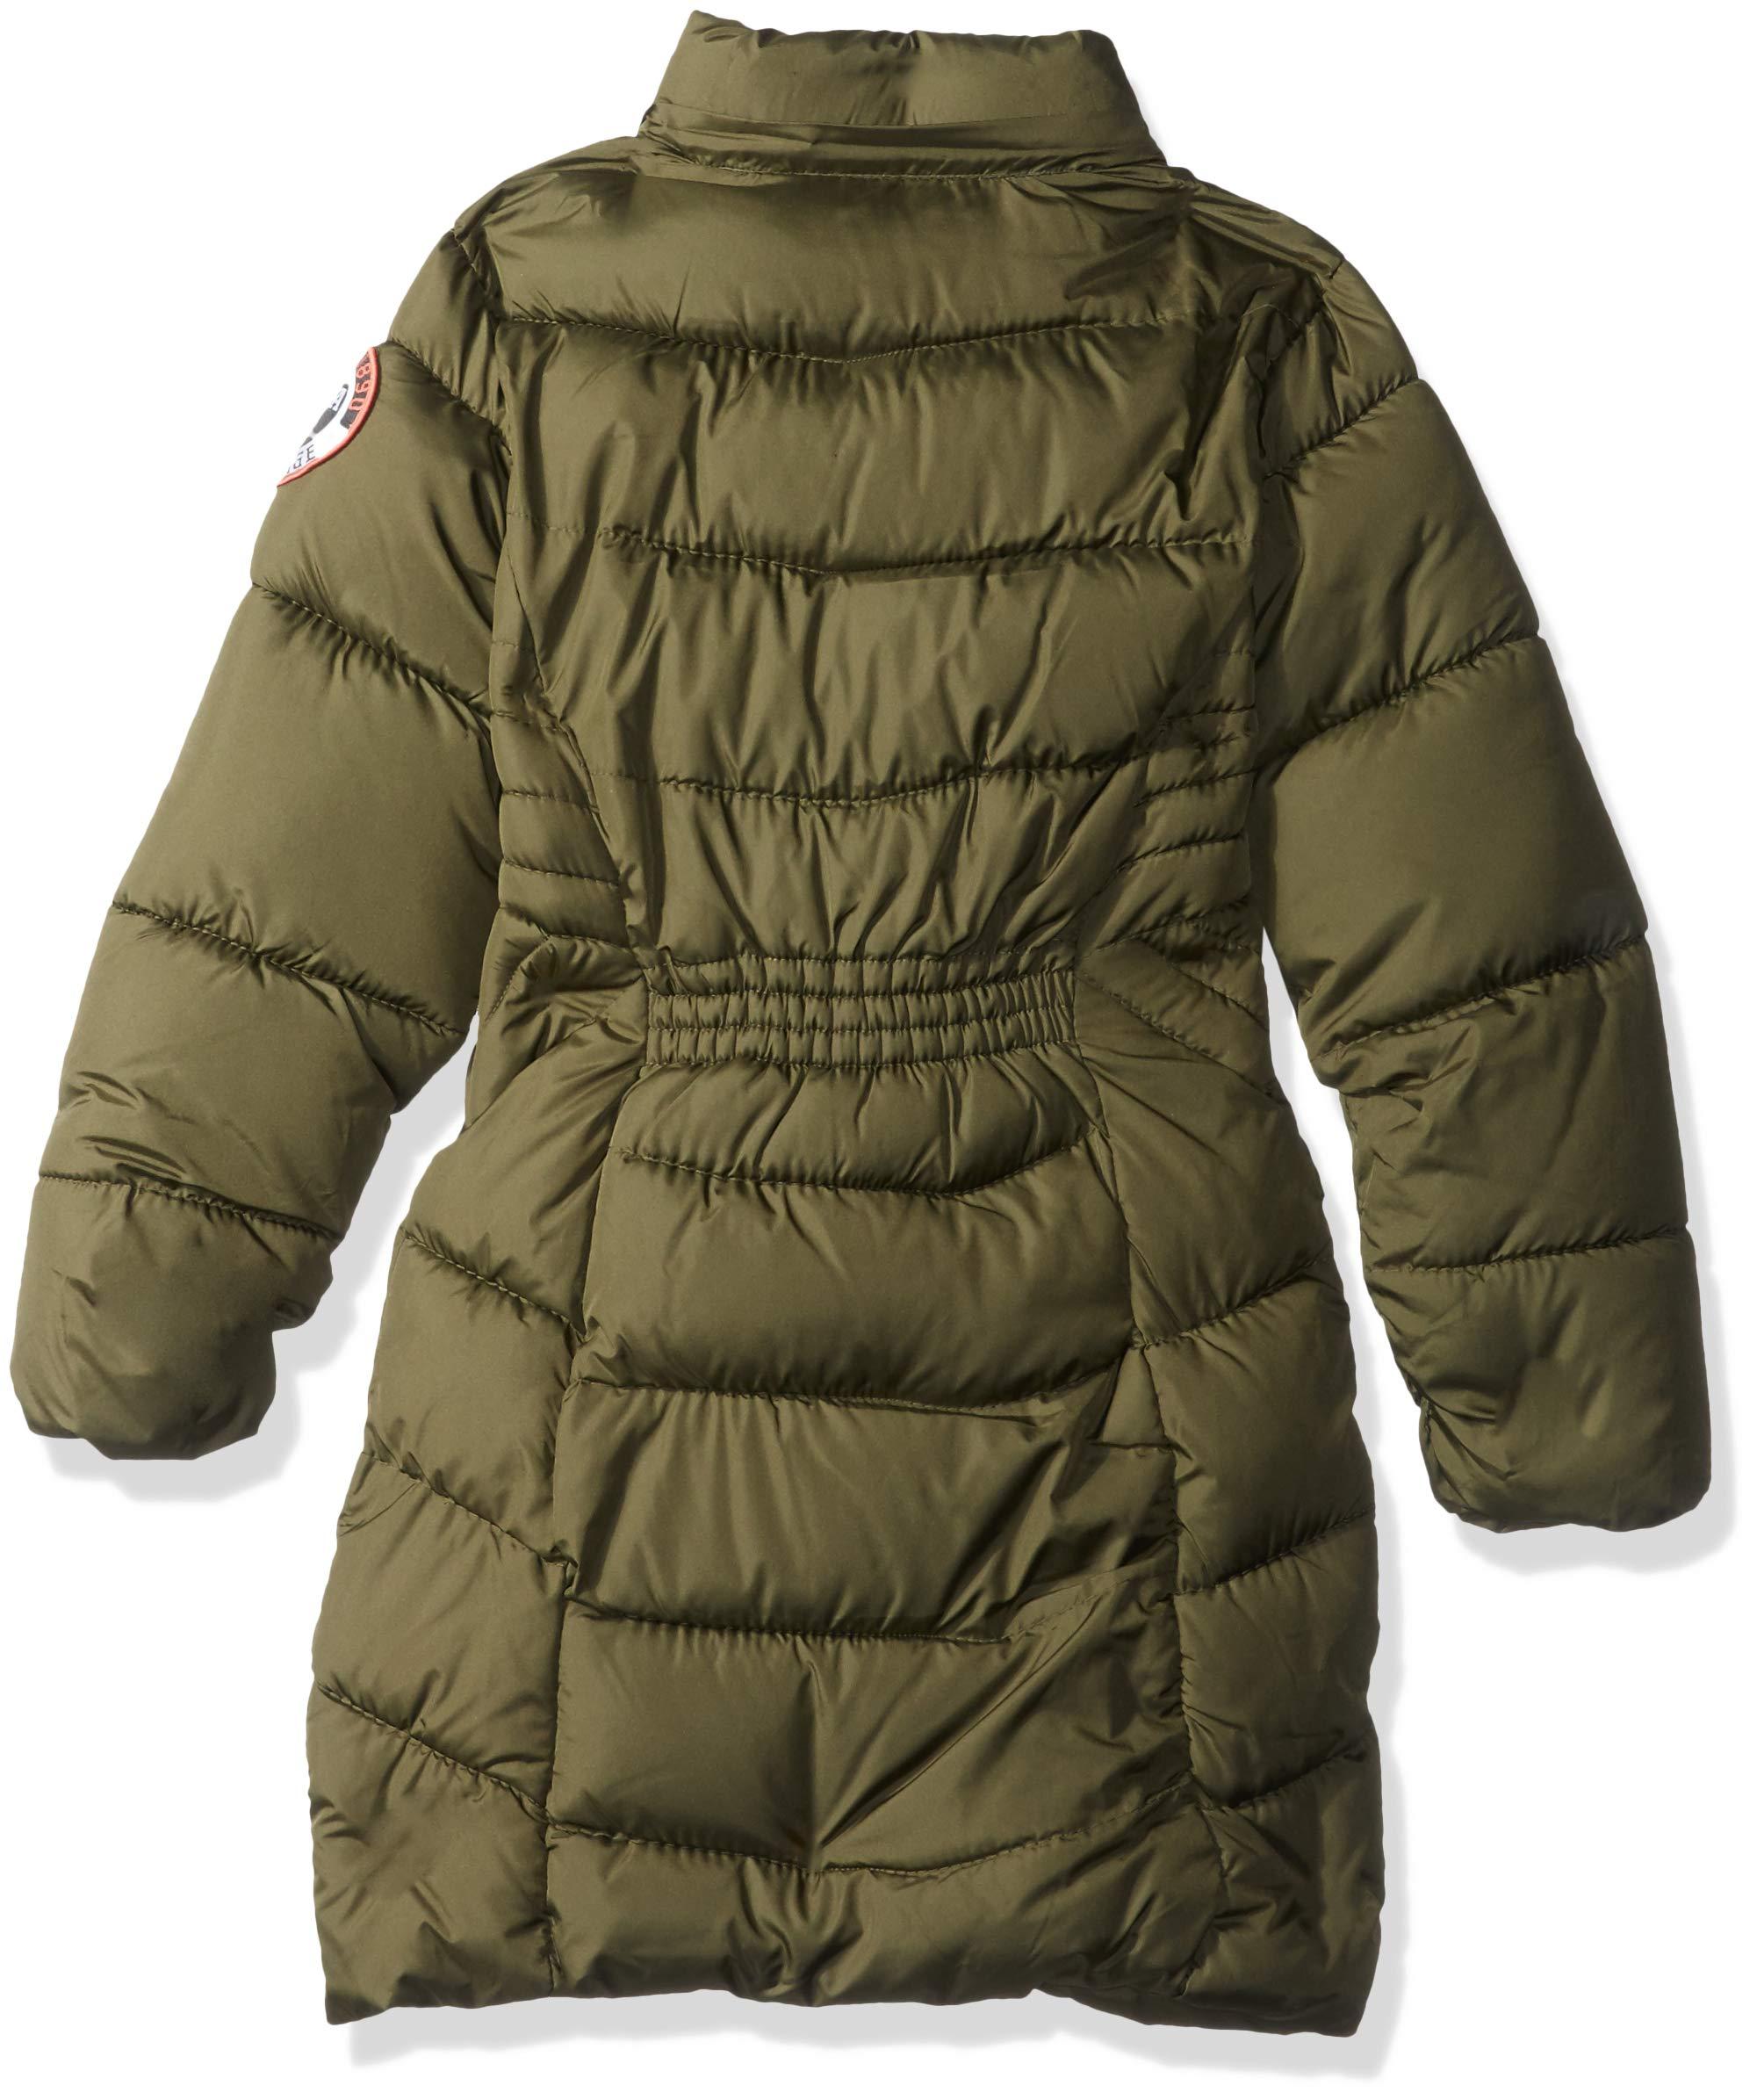 US Polo Association Girls' Big Long Bubble Jacket, Olive, 10/12 by U.S. Polo Assn. (Image #2)